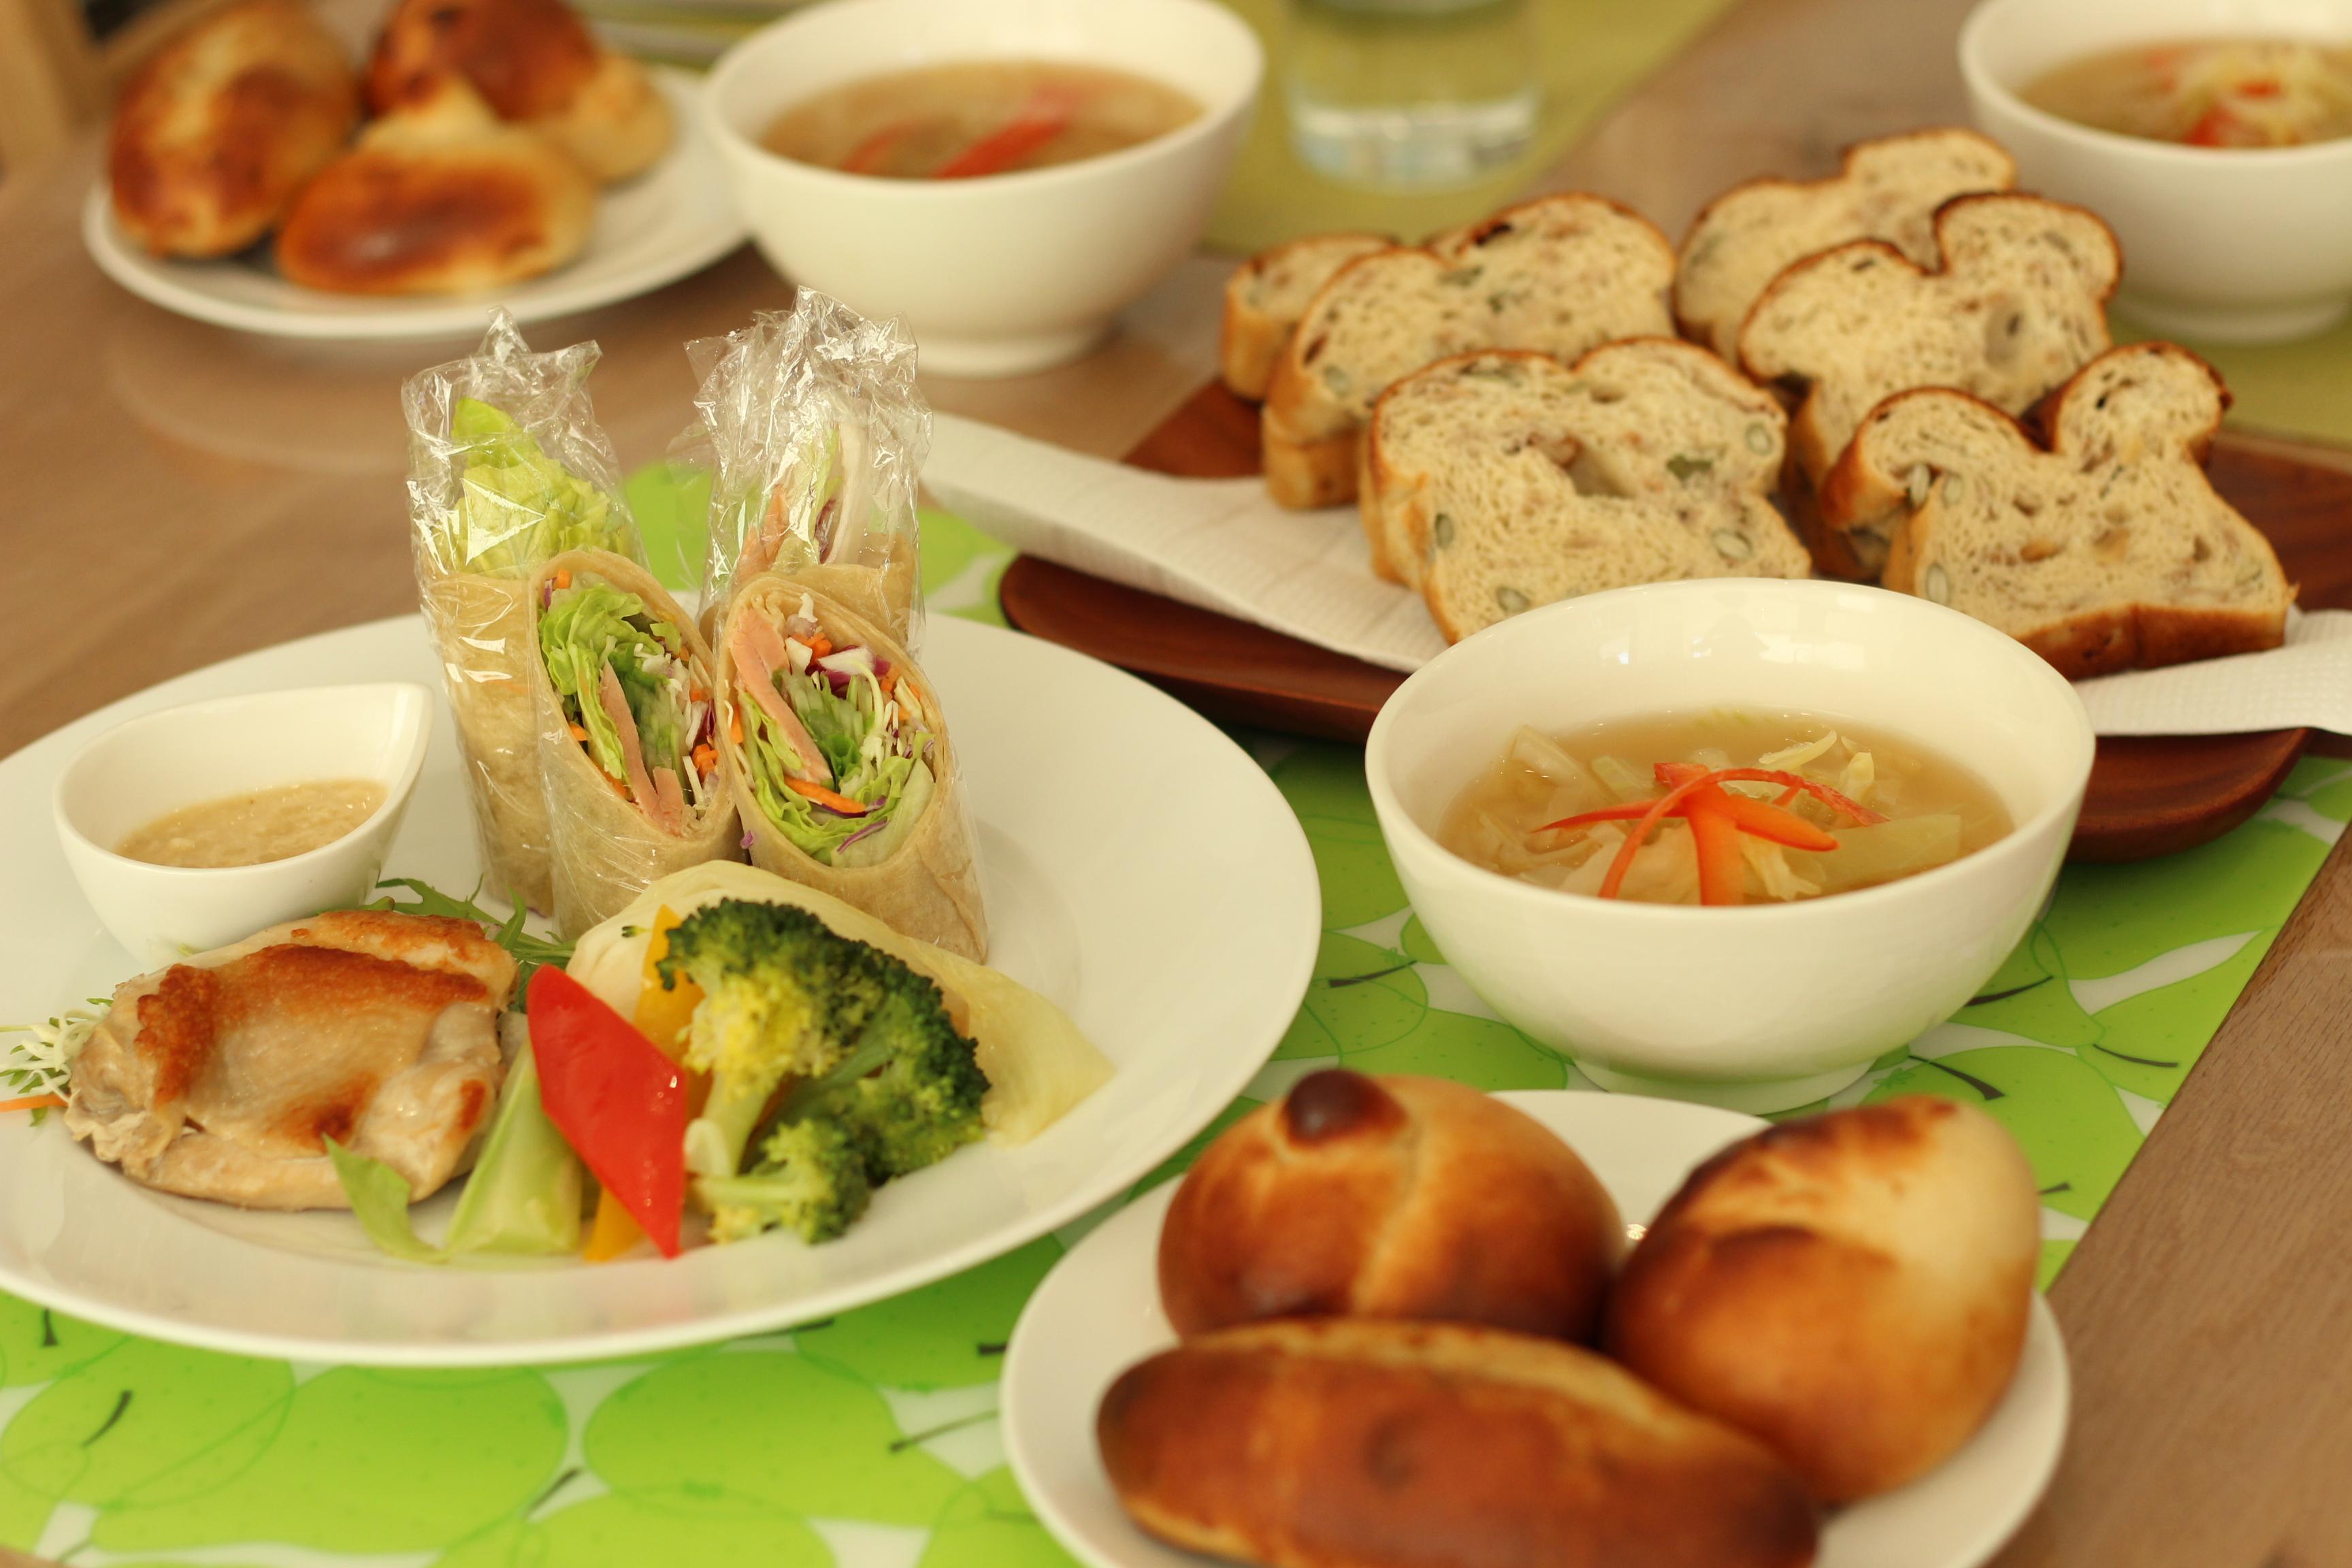 a-ta-sante糖質制限パン料理教室。京都江部粉糖質制限パン体験レッスン『プチパン&ナッツブレッド』